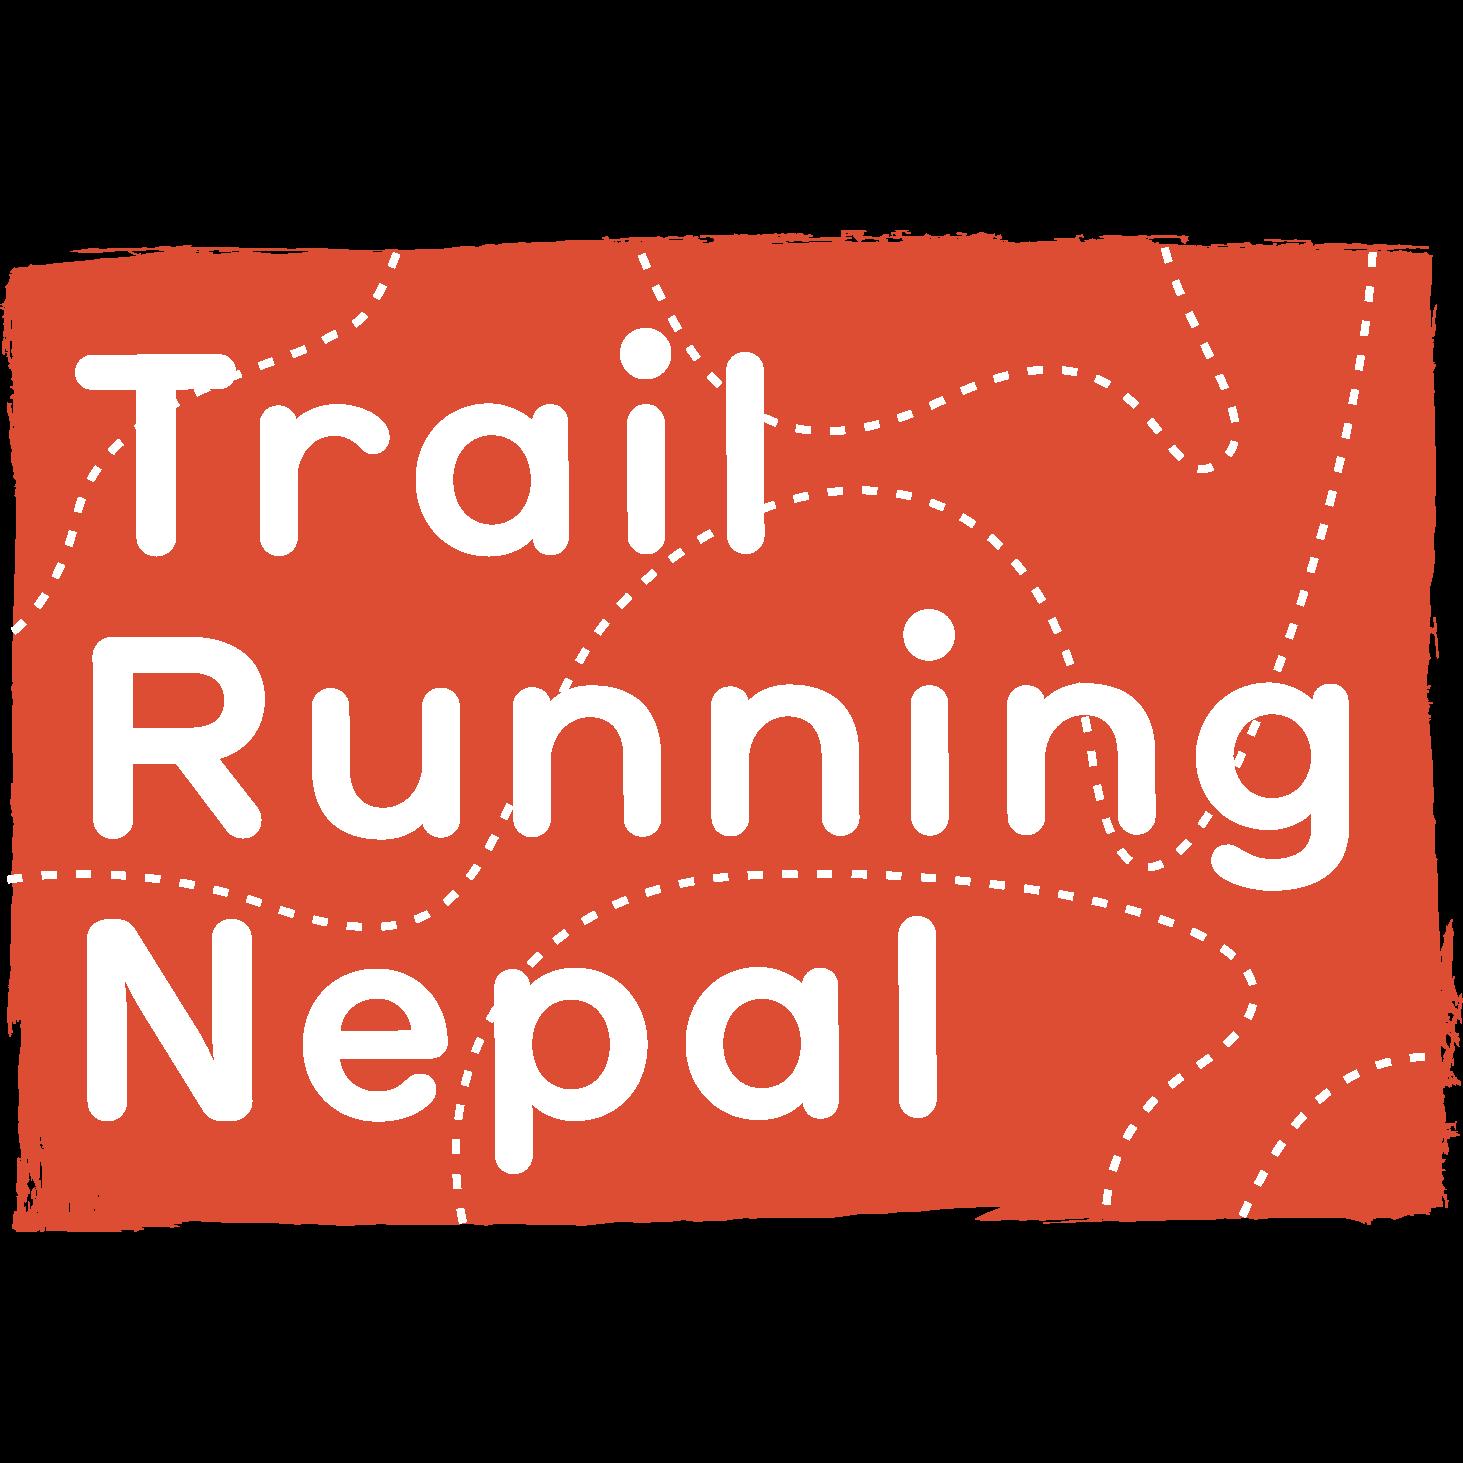 Trail running nepal logo